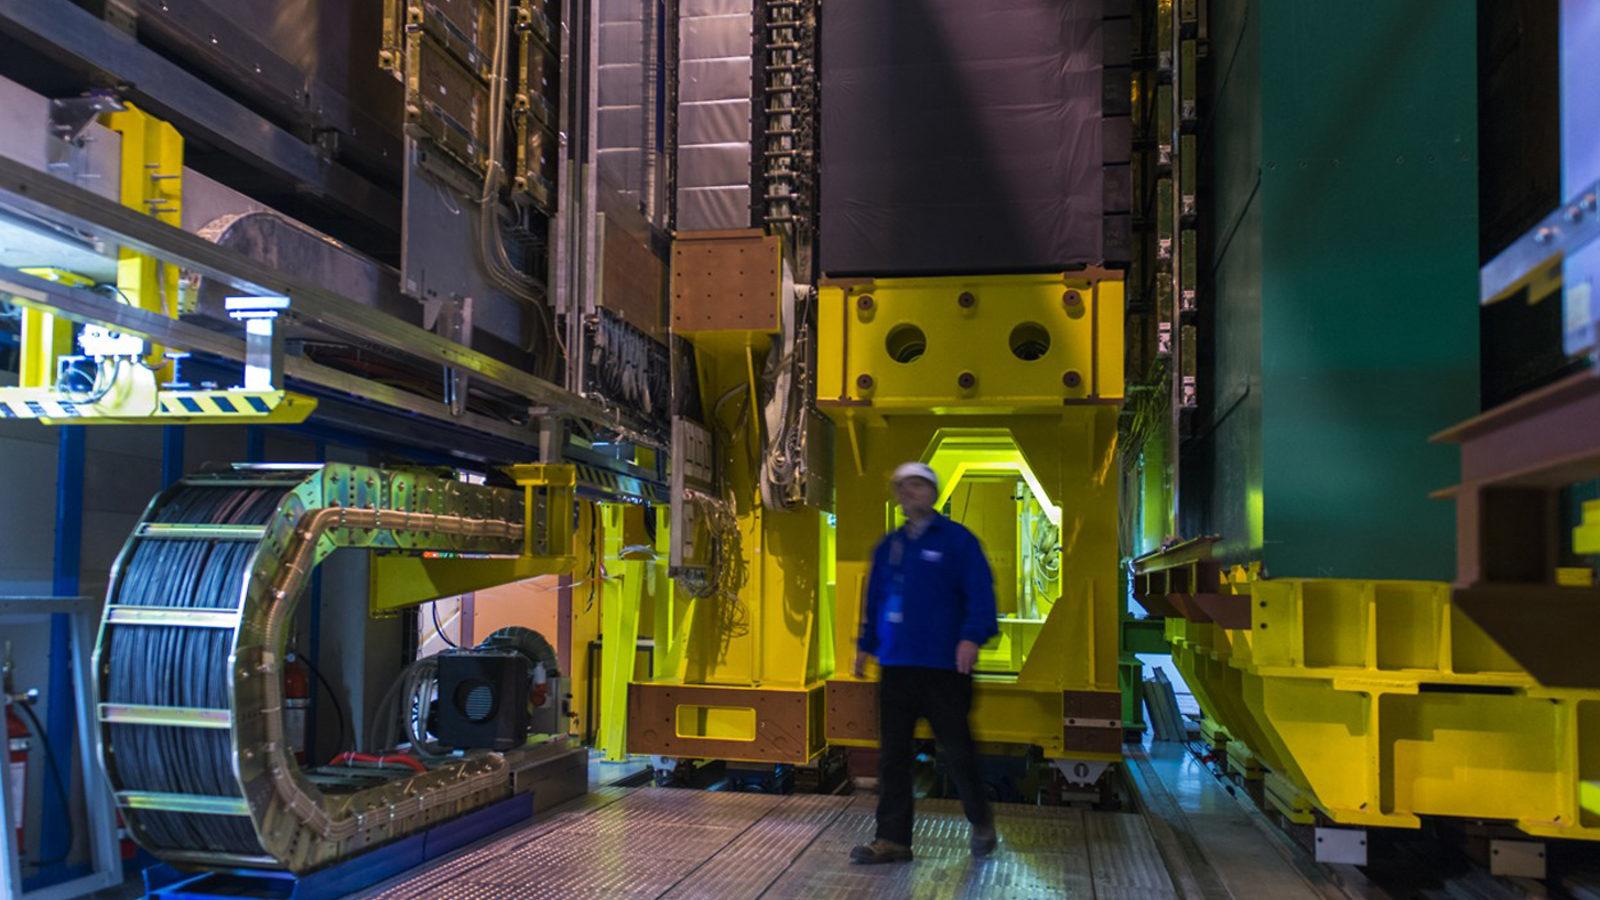 Photo: LHCb